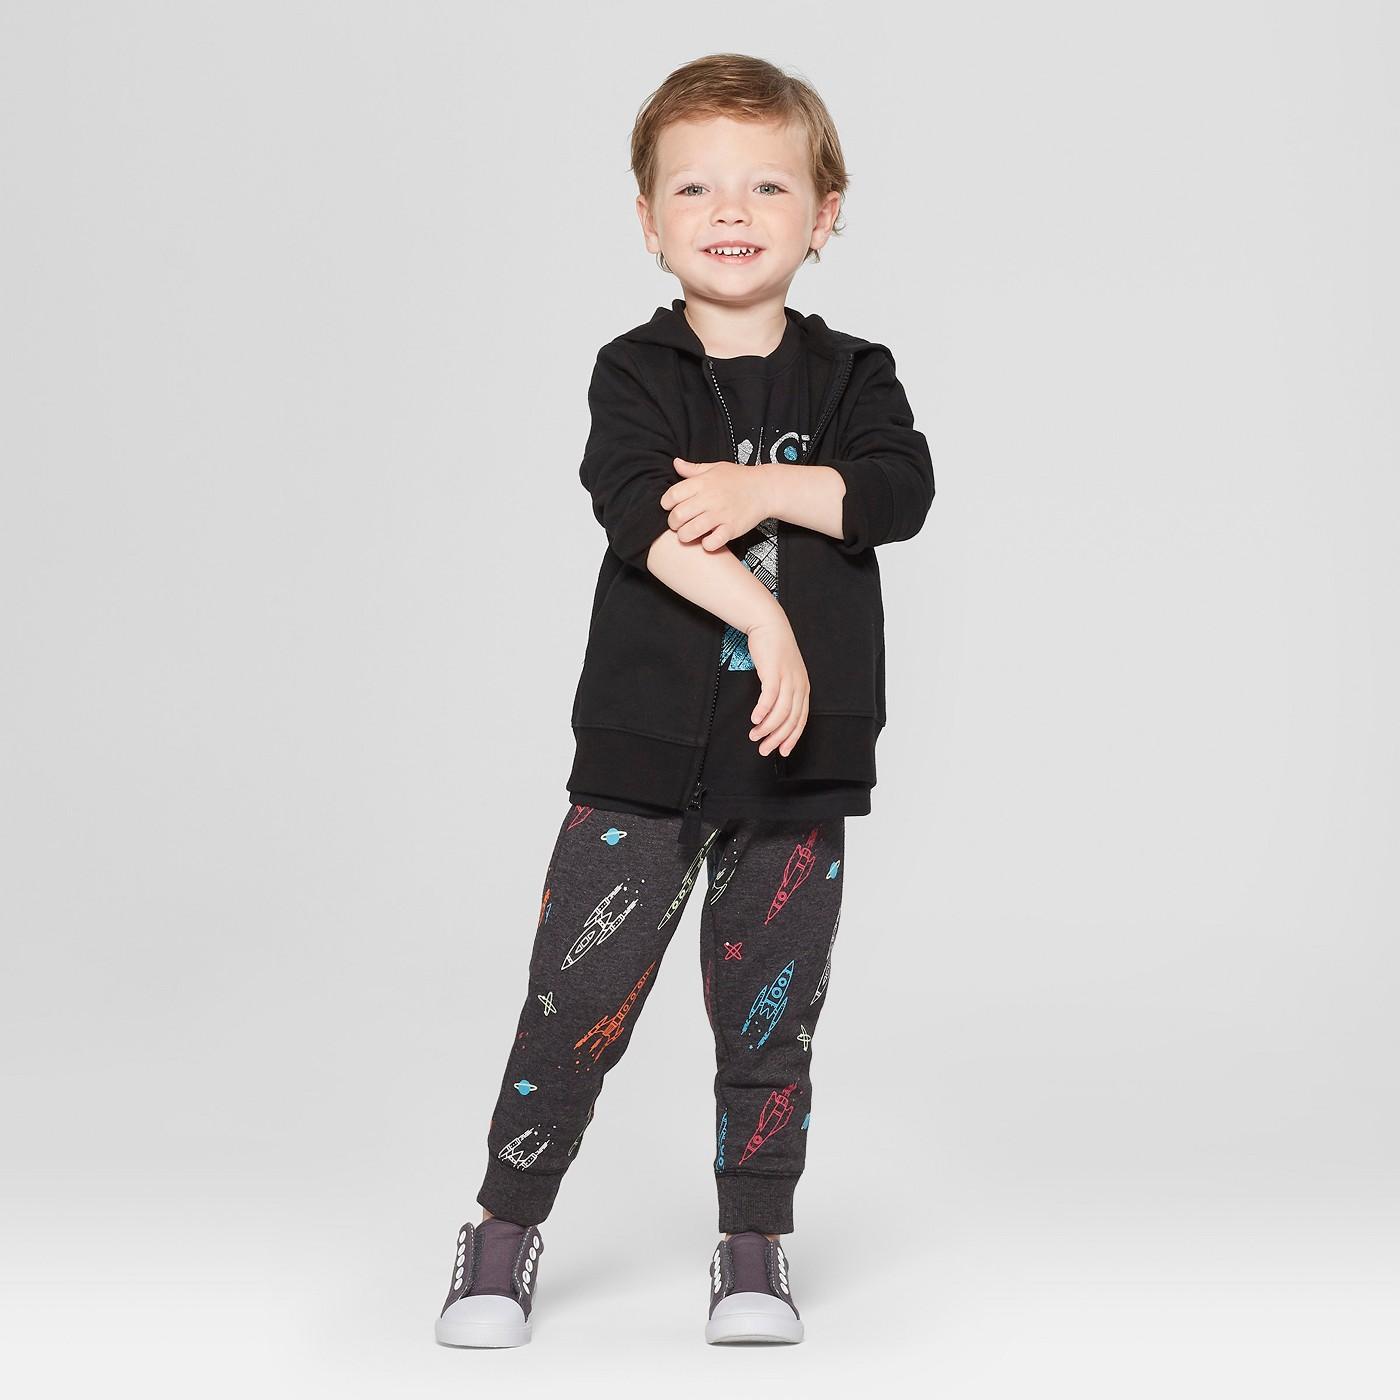 Toddler Boys' Jogger Spaceship Pants - Cat & Jack™ - image 3 of 3